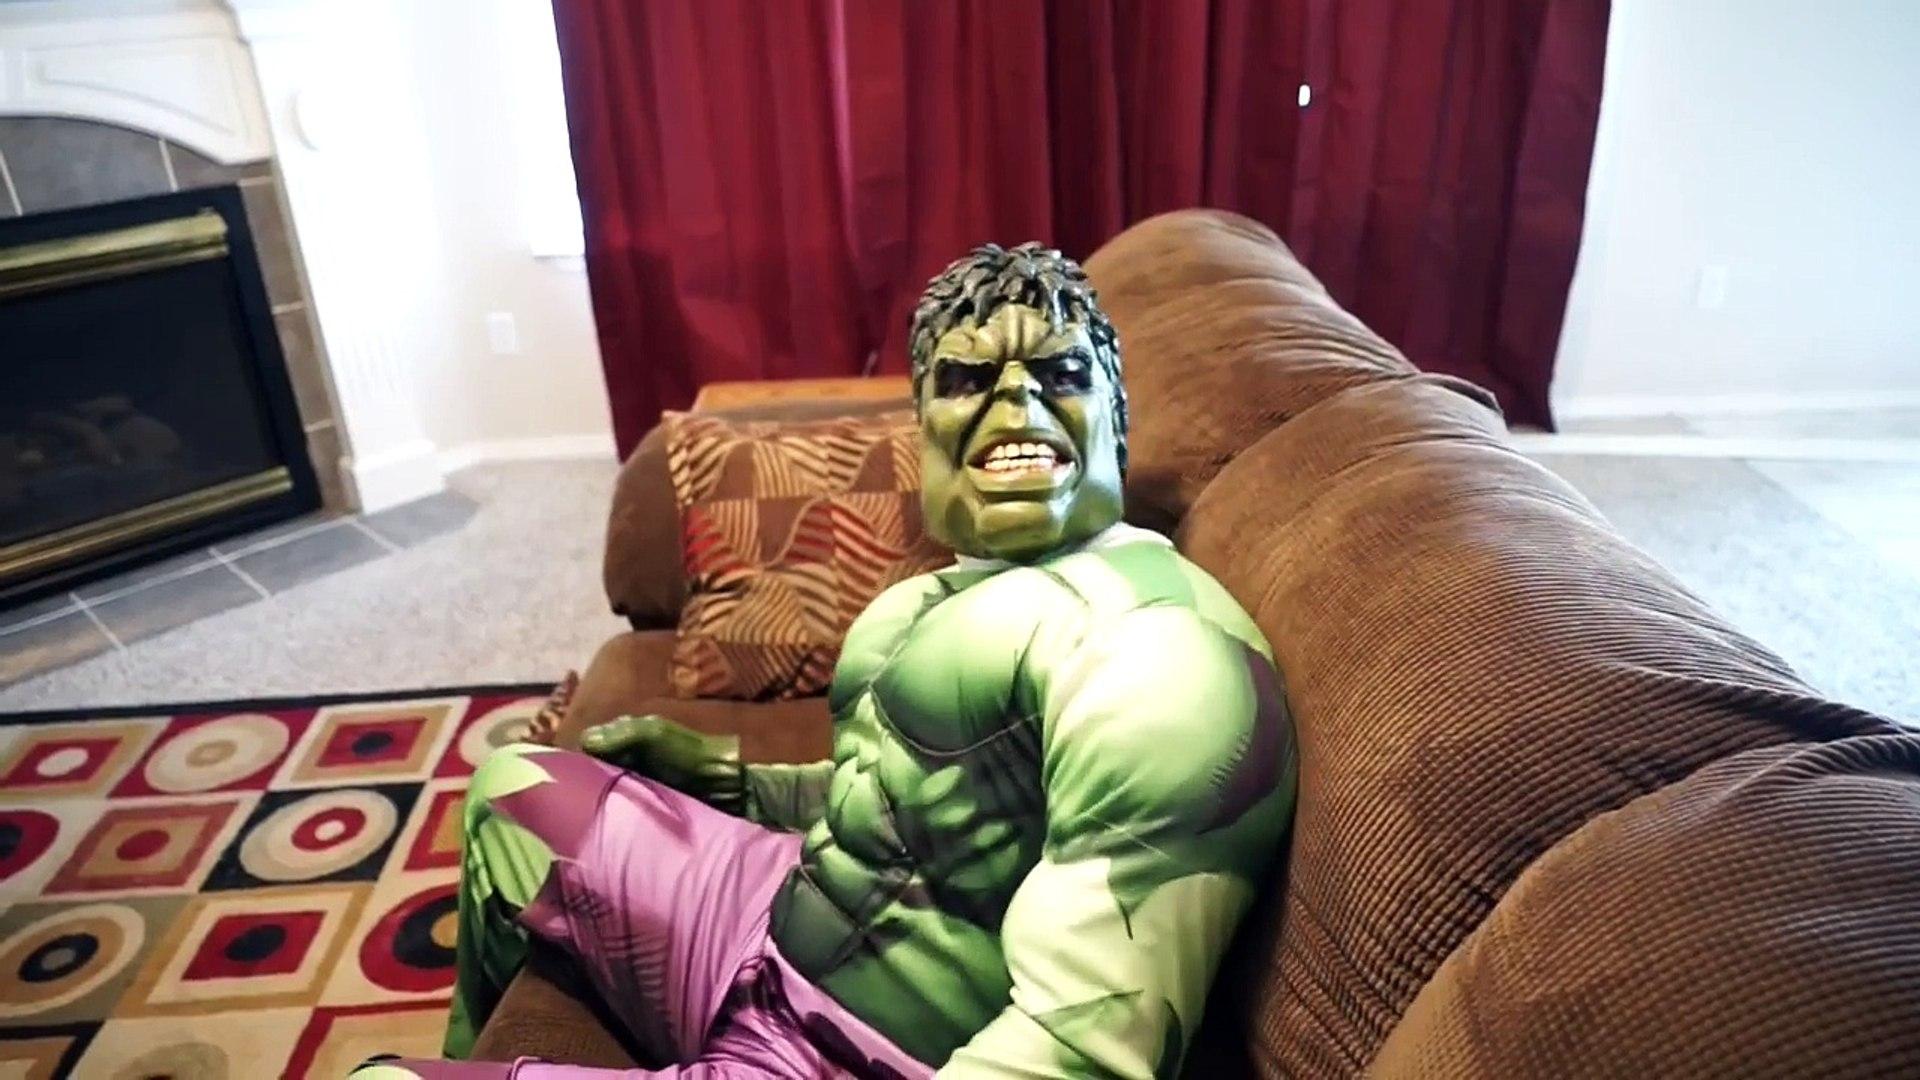 Spiderman T Rex Hulk Vs Joker In Real Life Superhero Movie Video Dailymotion